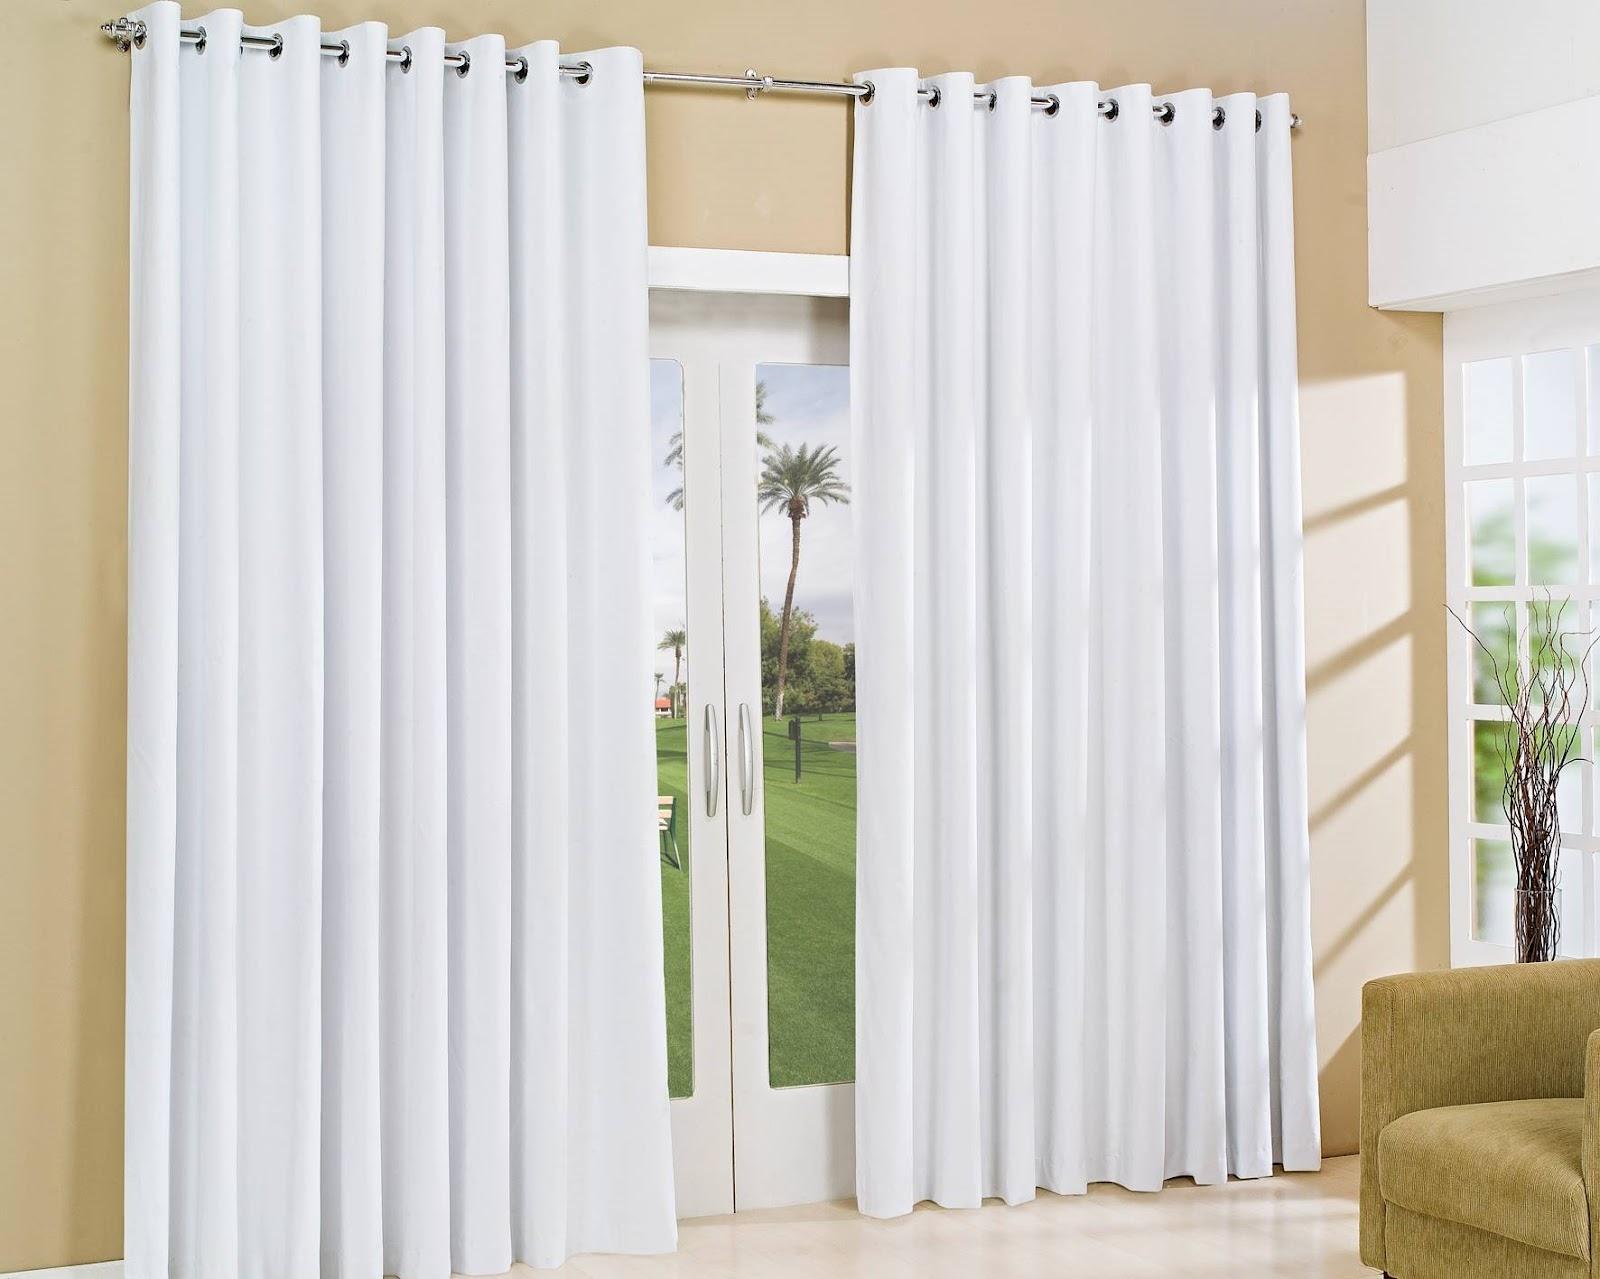 Telas de cortinas imagui for Telas para cortinas infantiles